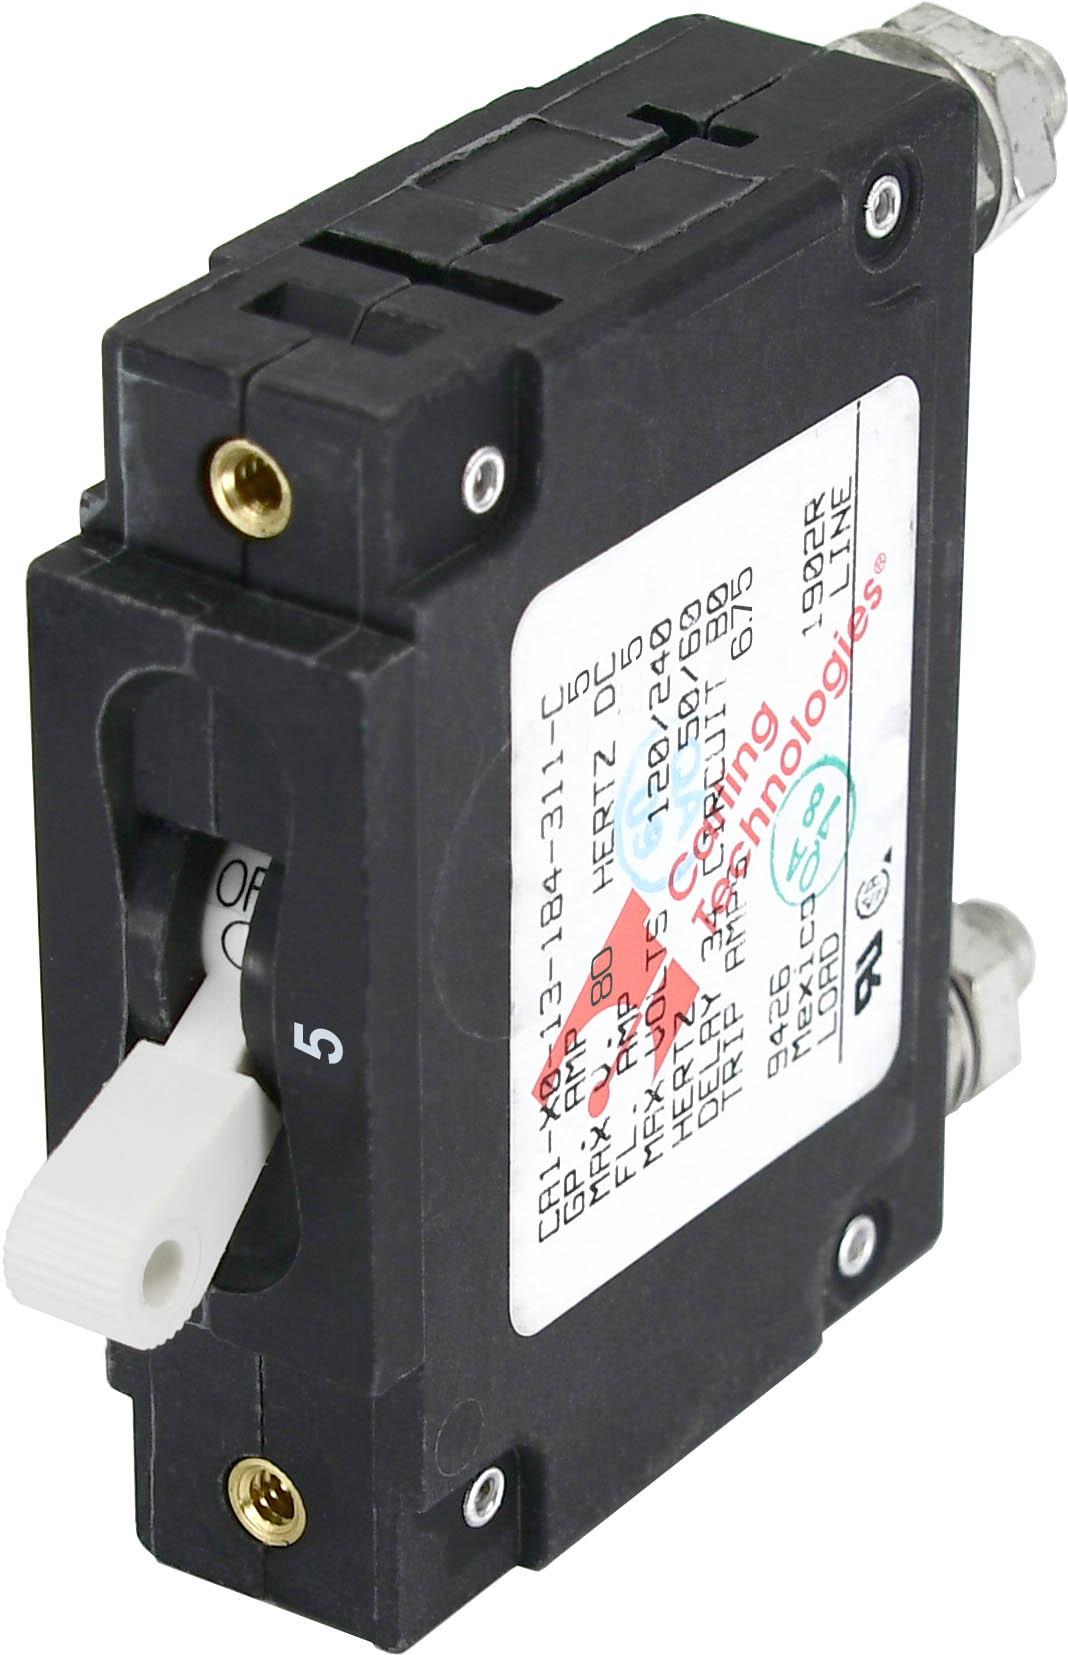 C Series White Toggle Circuit Breaker